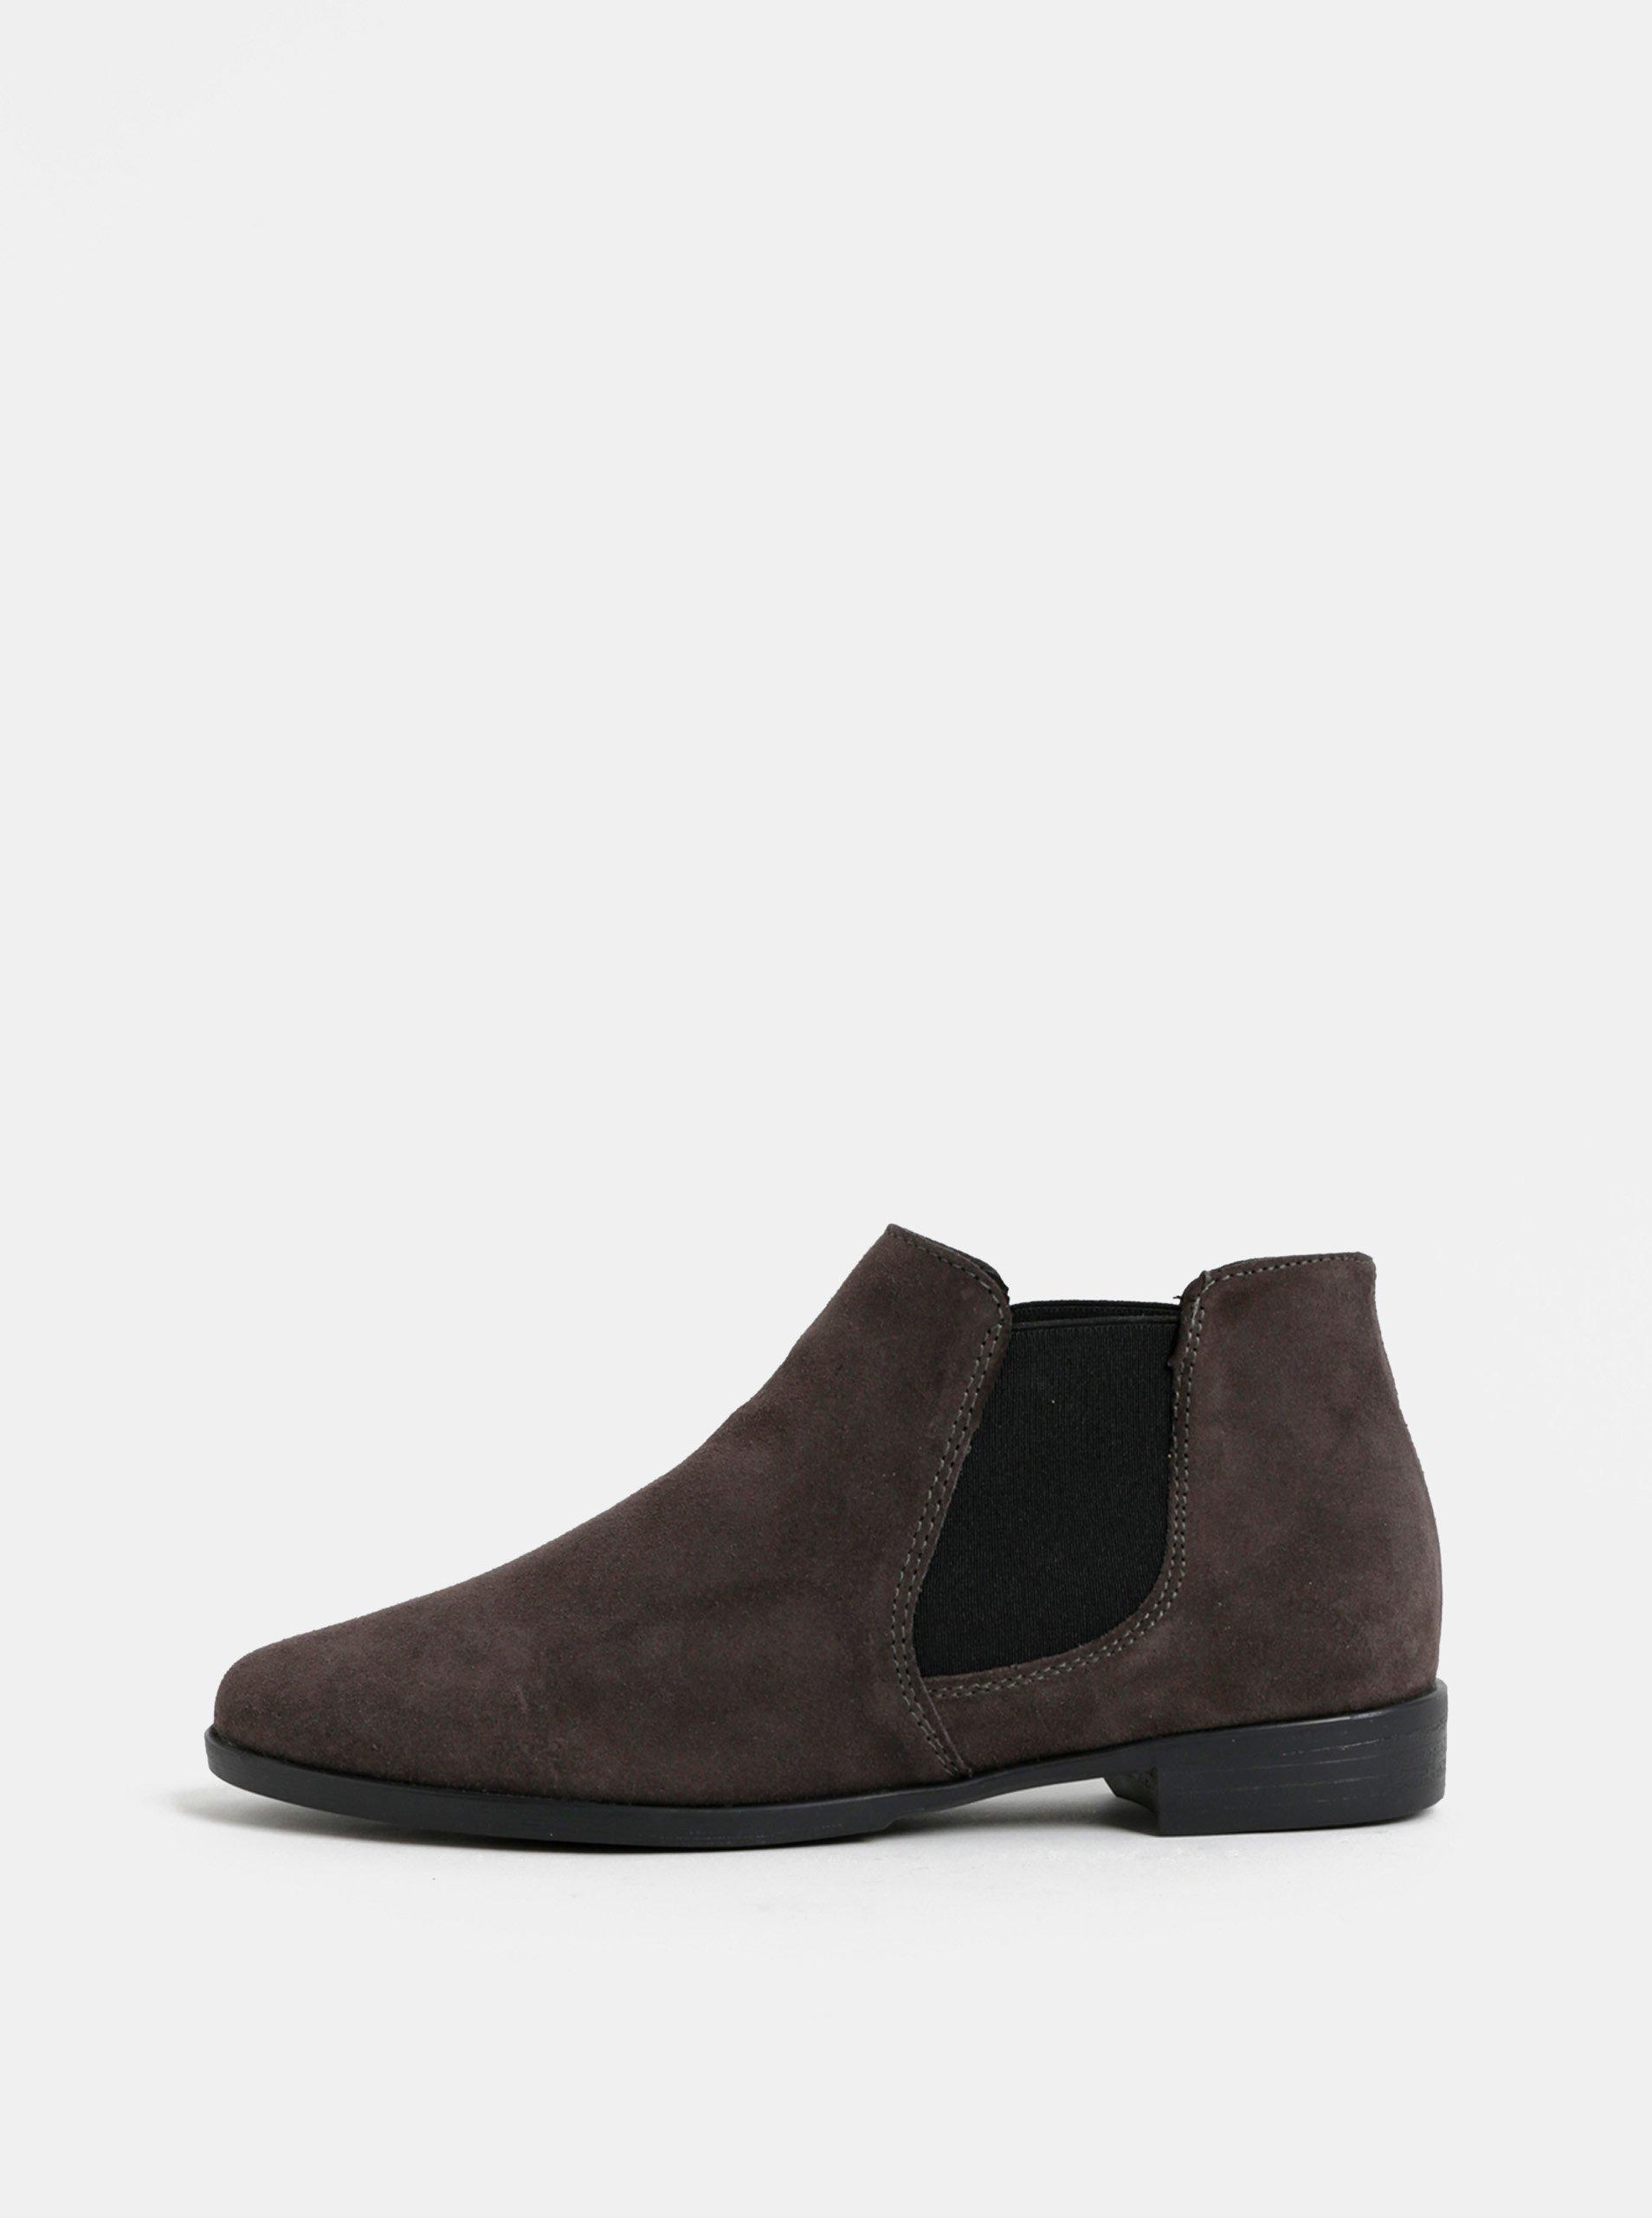 Tmavě hnědé semišové chelsea boty Tamaris